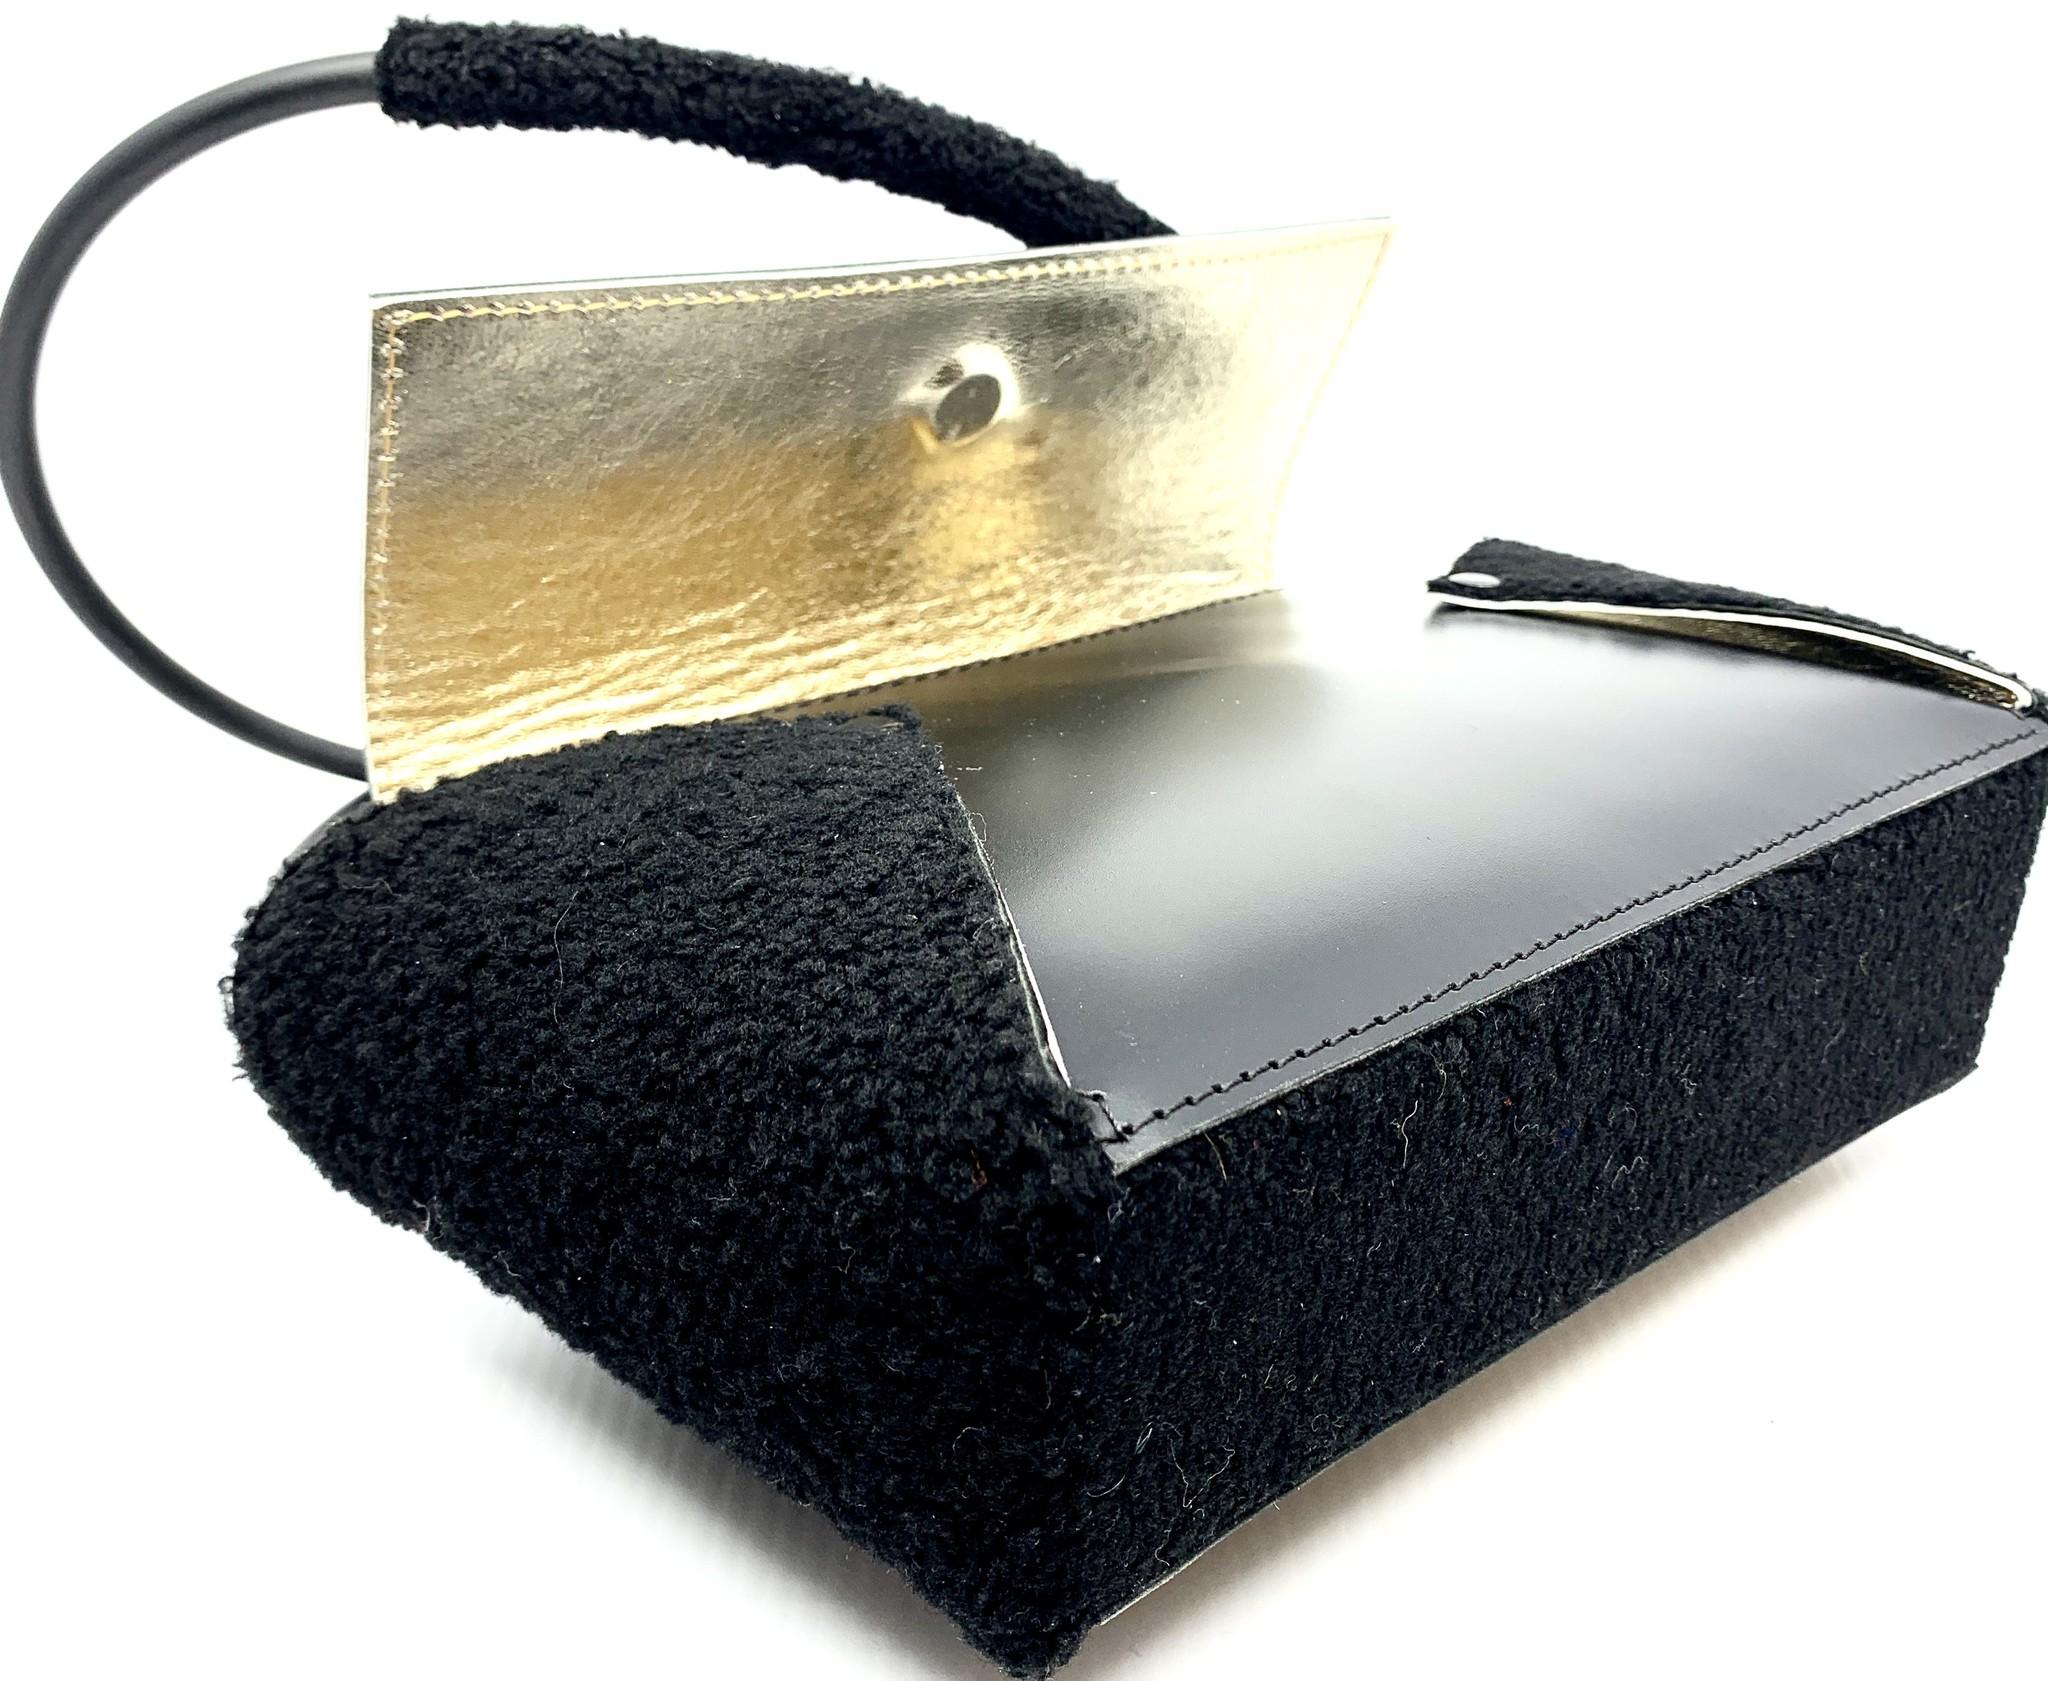 PAARL Unieke handgemaakte en gegraveerde handtas afbeelding Elisabeth Borluut - PAARL